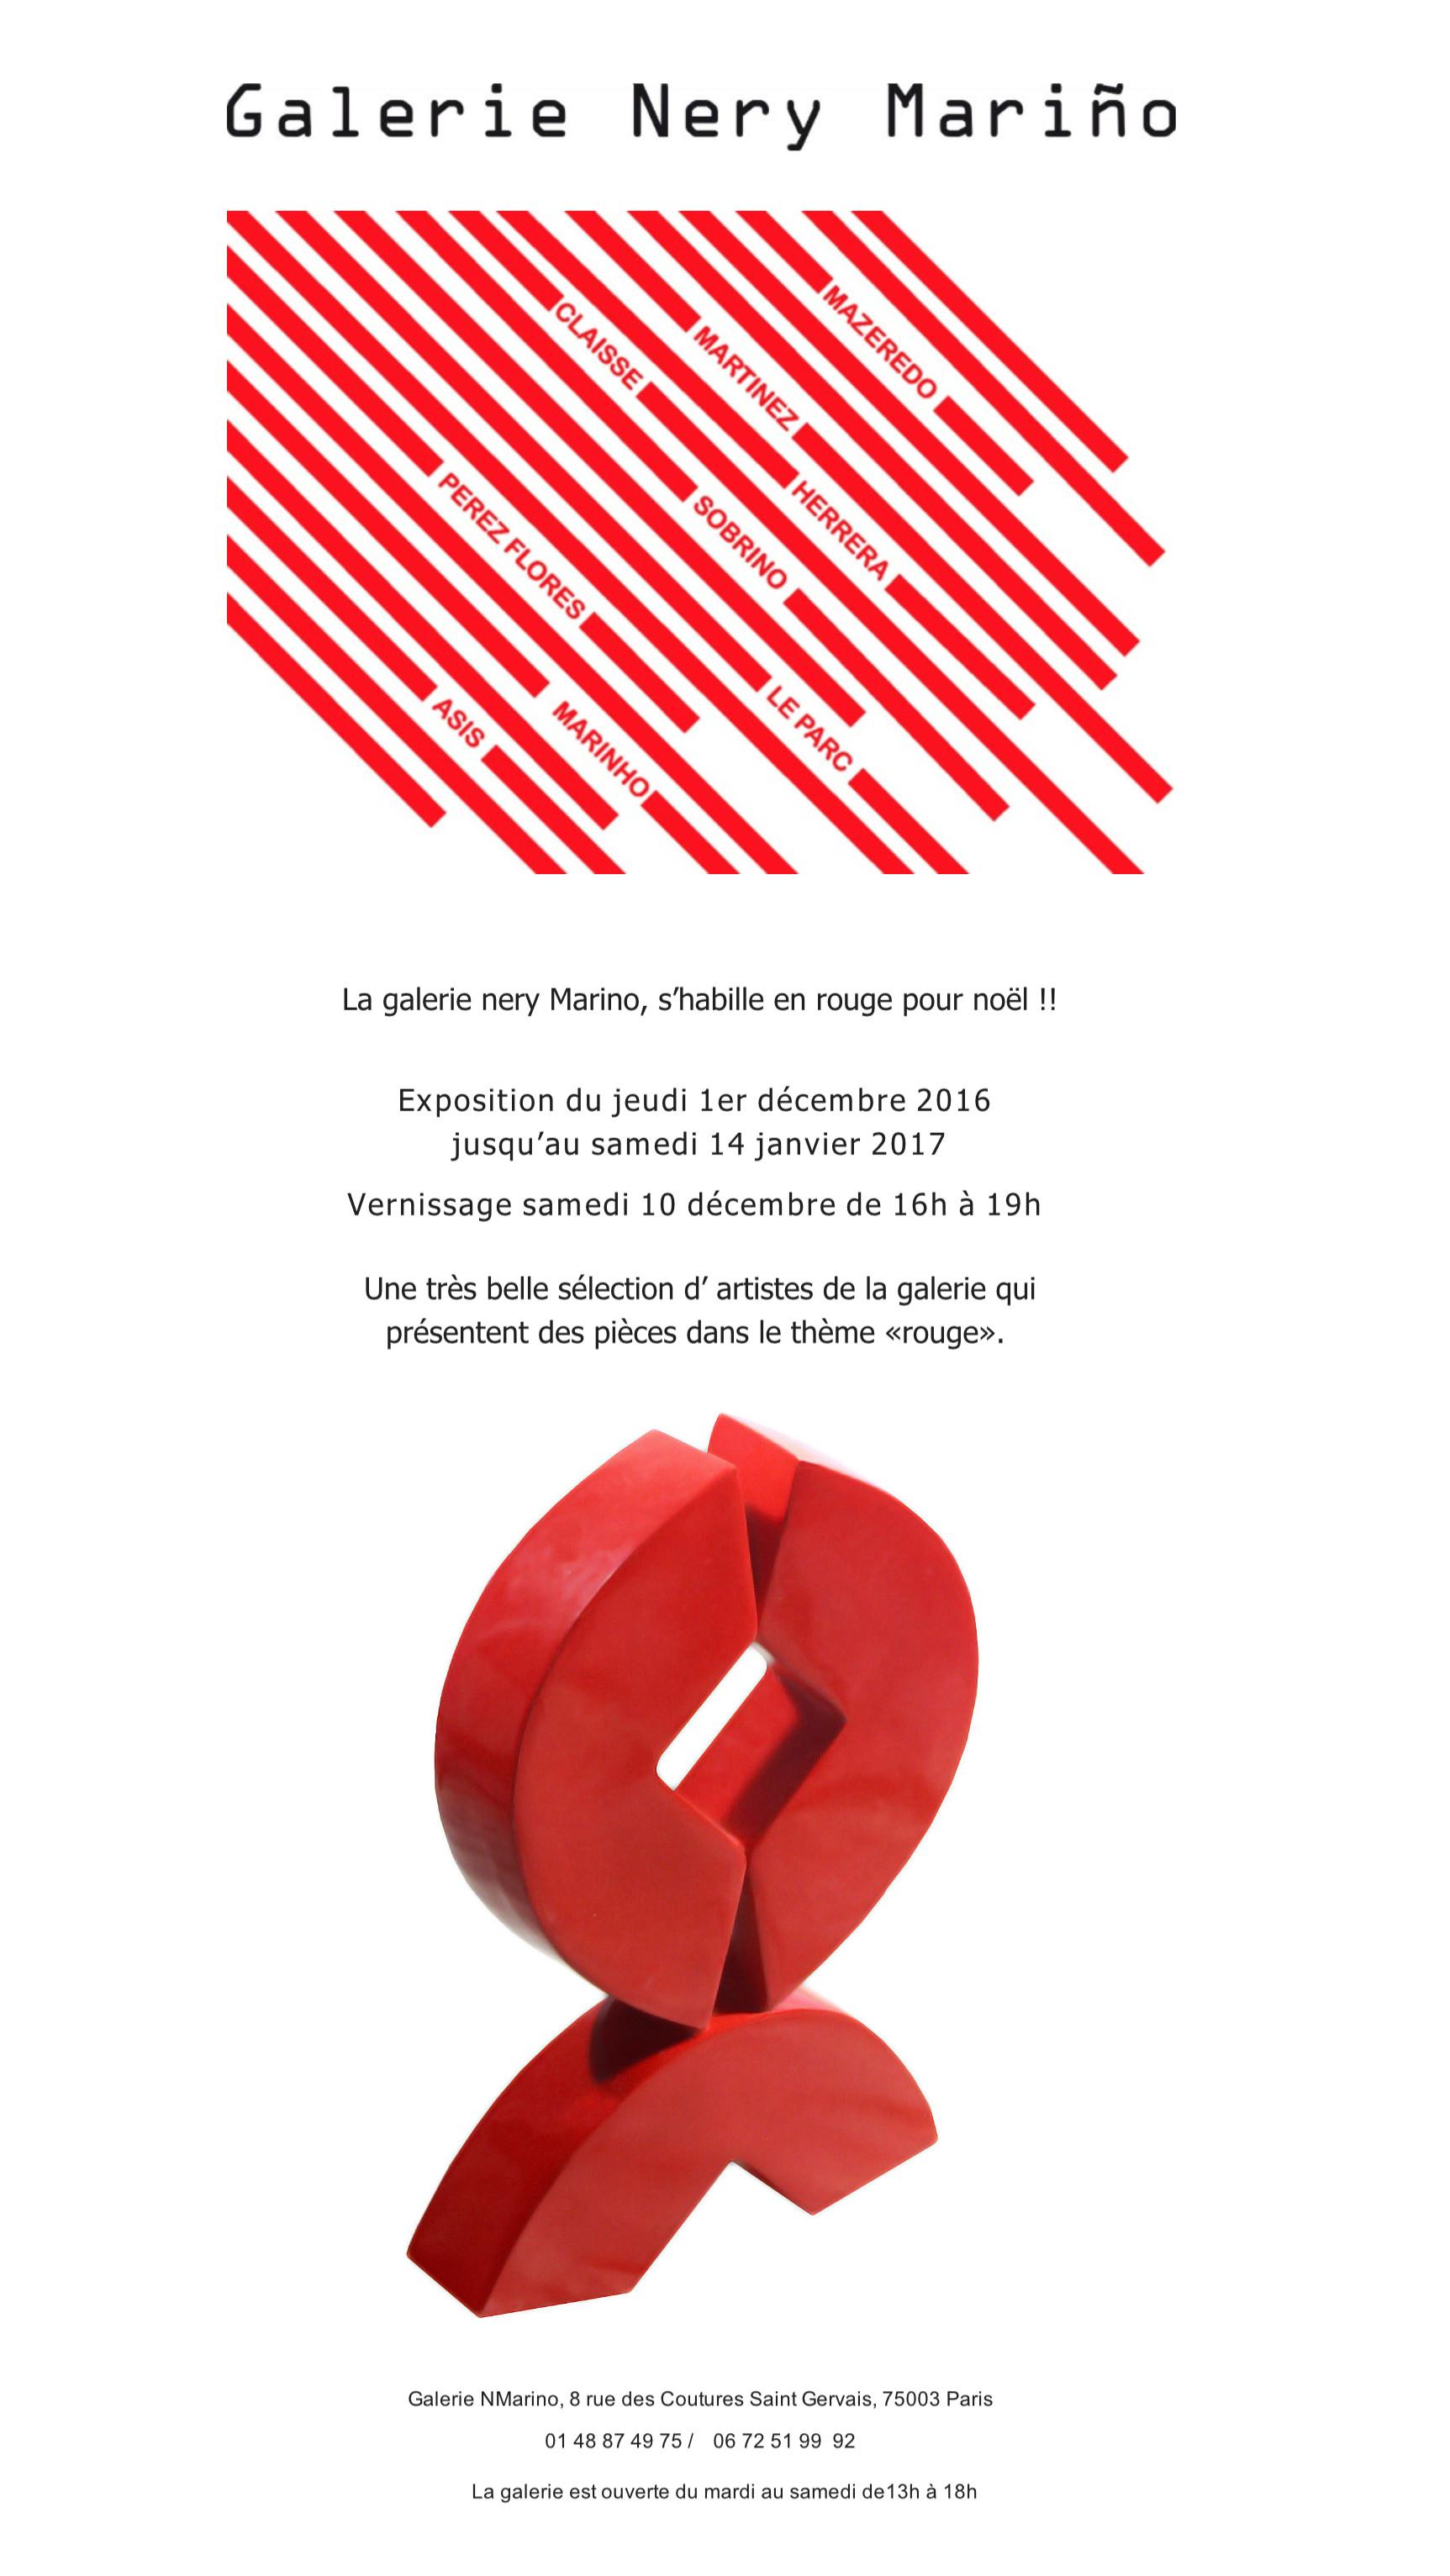 Convite Paris 2016 - Galerie Nery Marino